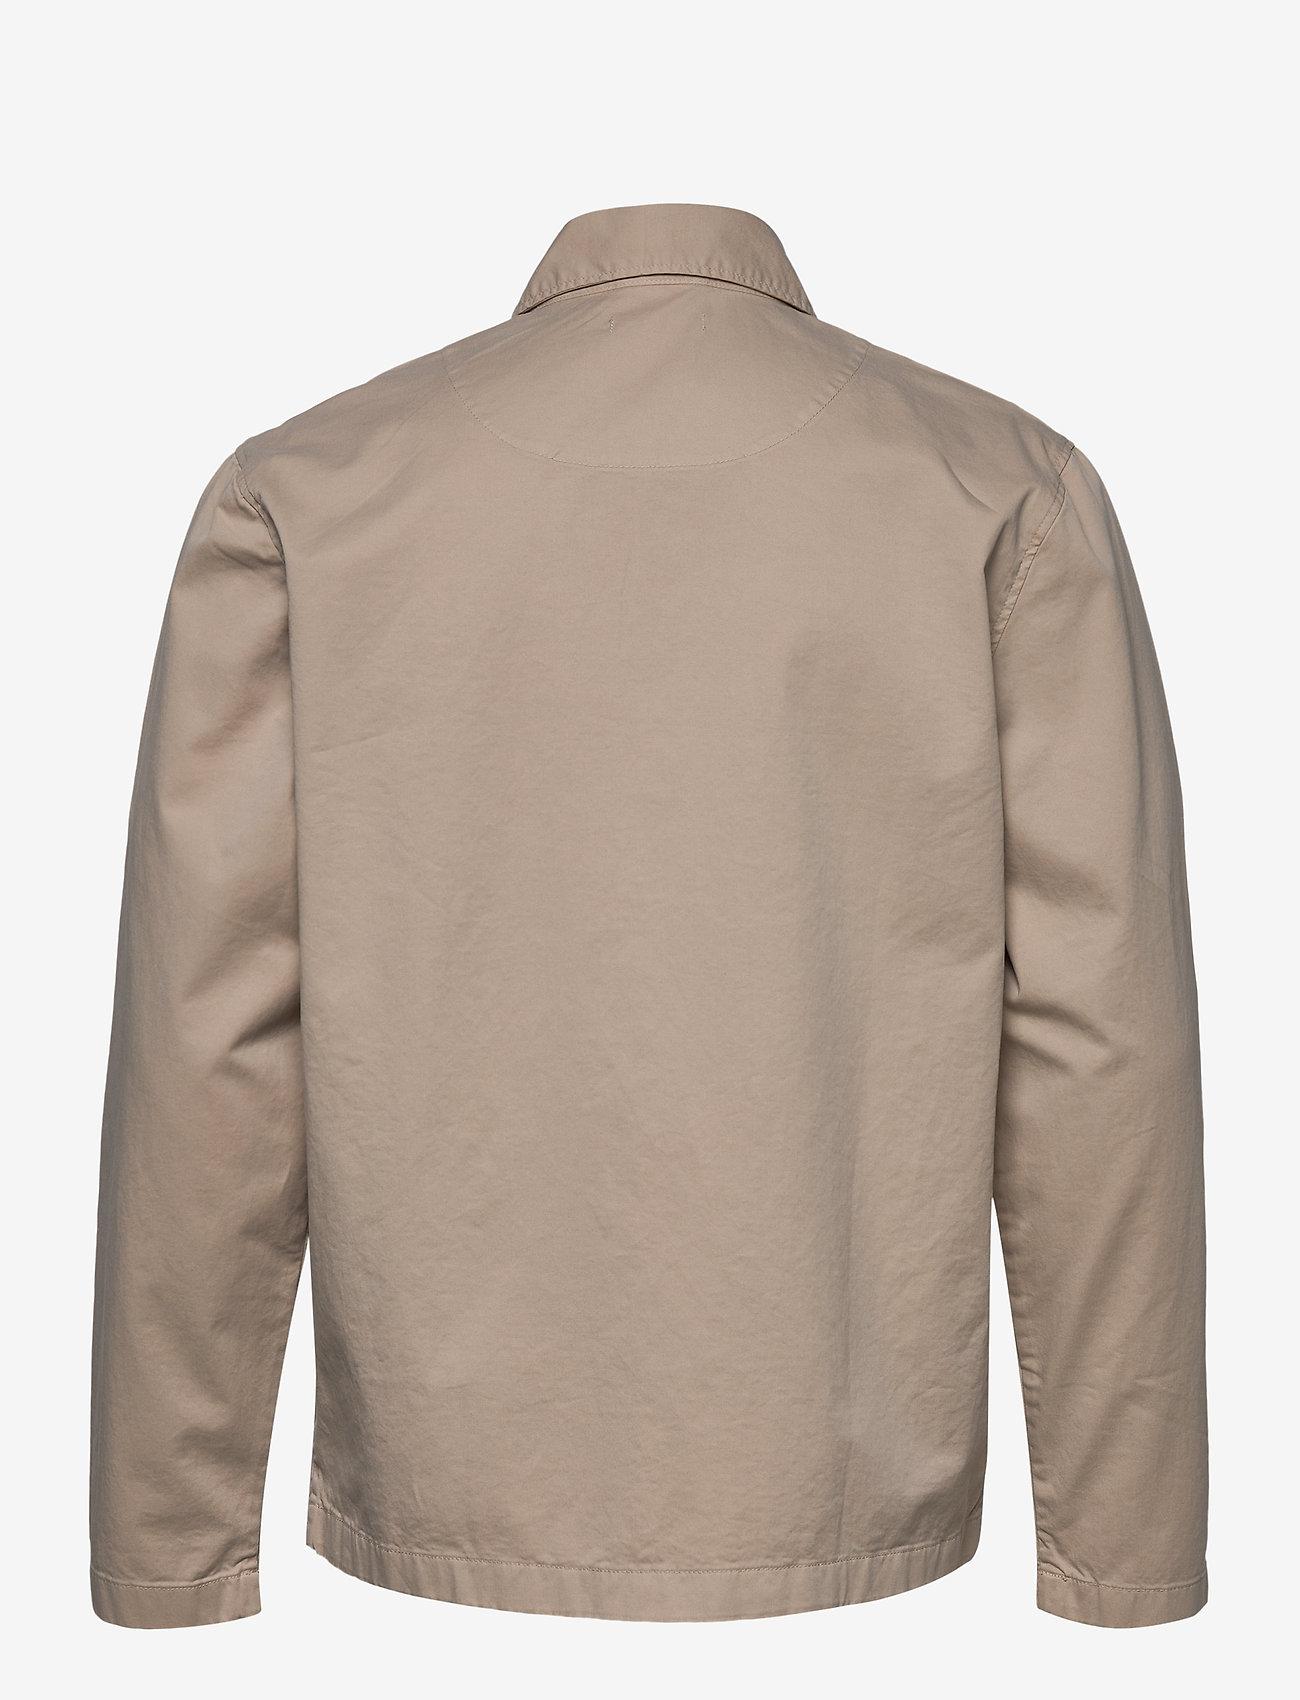 Knowledge Cotton Apparel - PINE poplin overshirt - GOTS/Vegan - kleding - light feather gray - 1